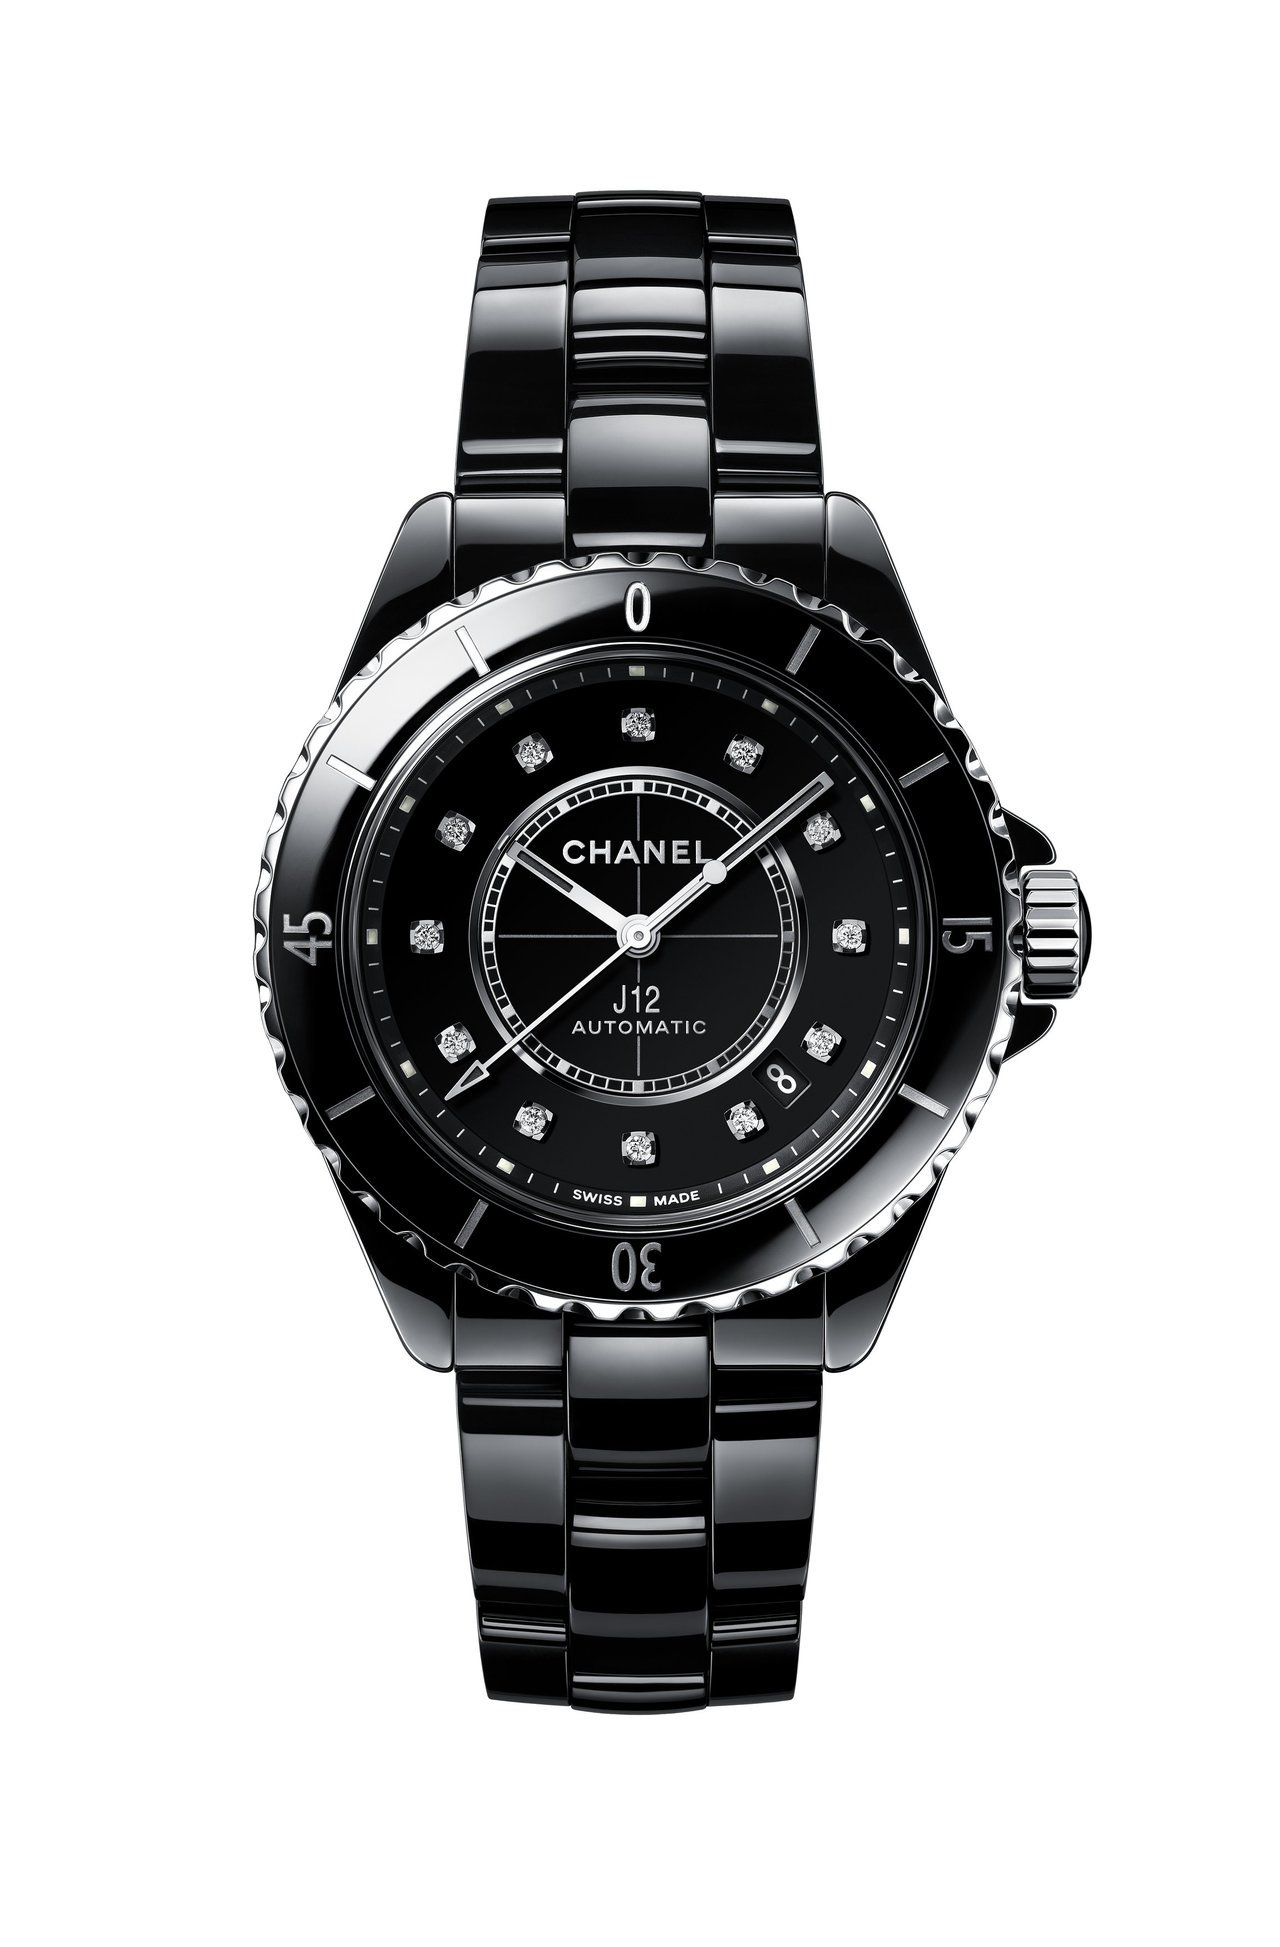 J12自動腕表,黑色抗磨精密陶瓷搭配精鋼表殼 ,22萬7,000。圖/香奈兒提供